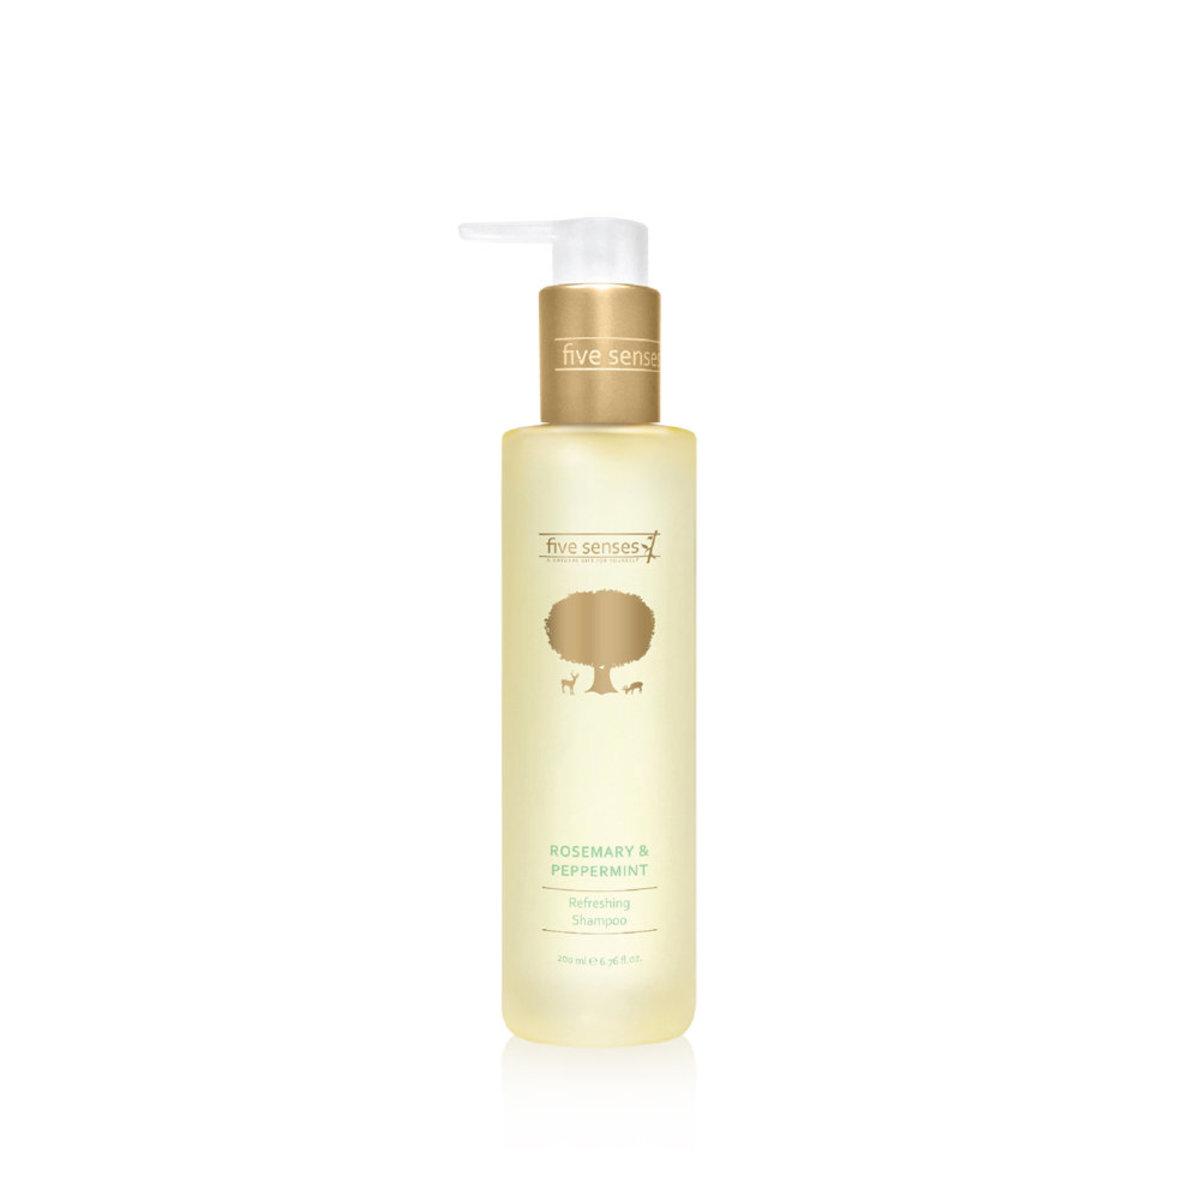 Rosemary & Peppermint Refreshing Shampoo  200ml